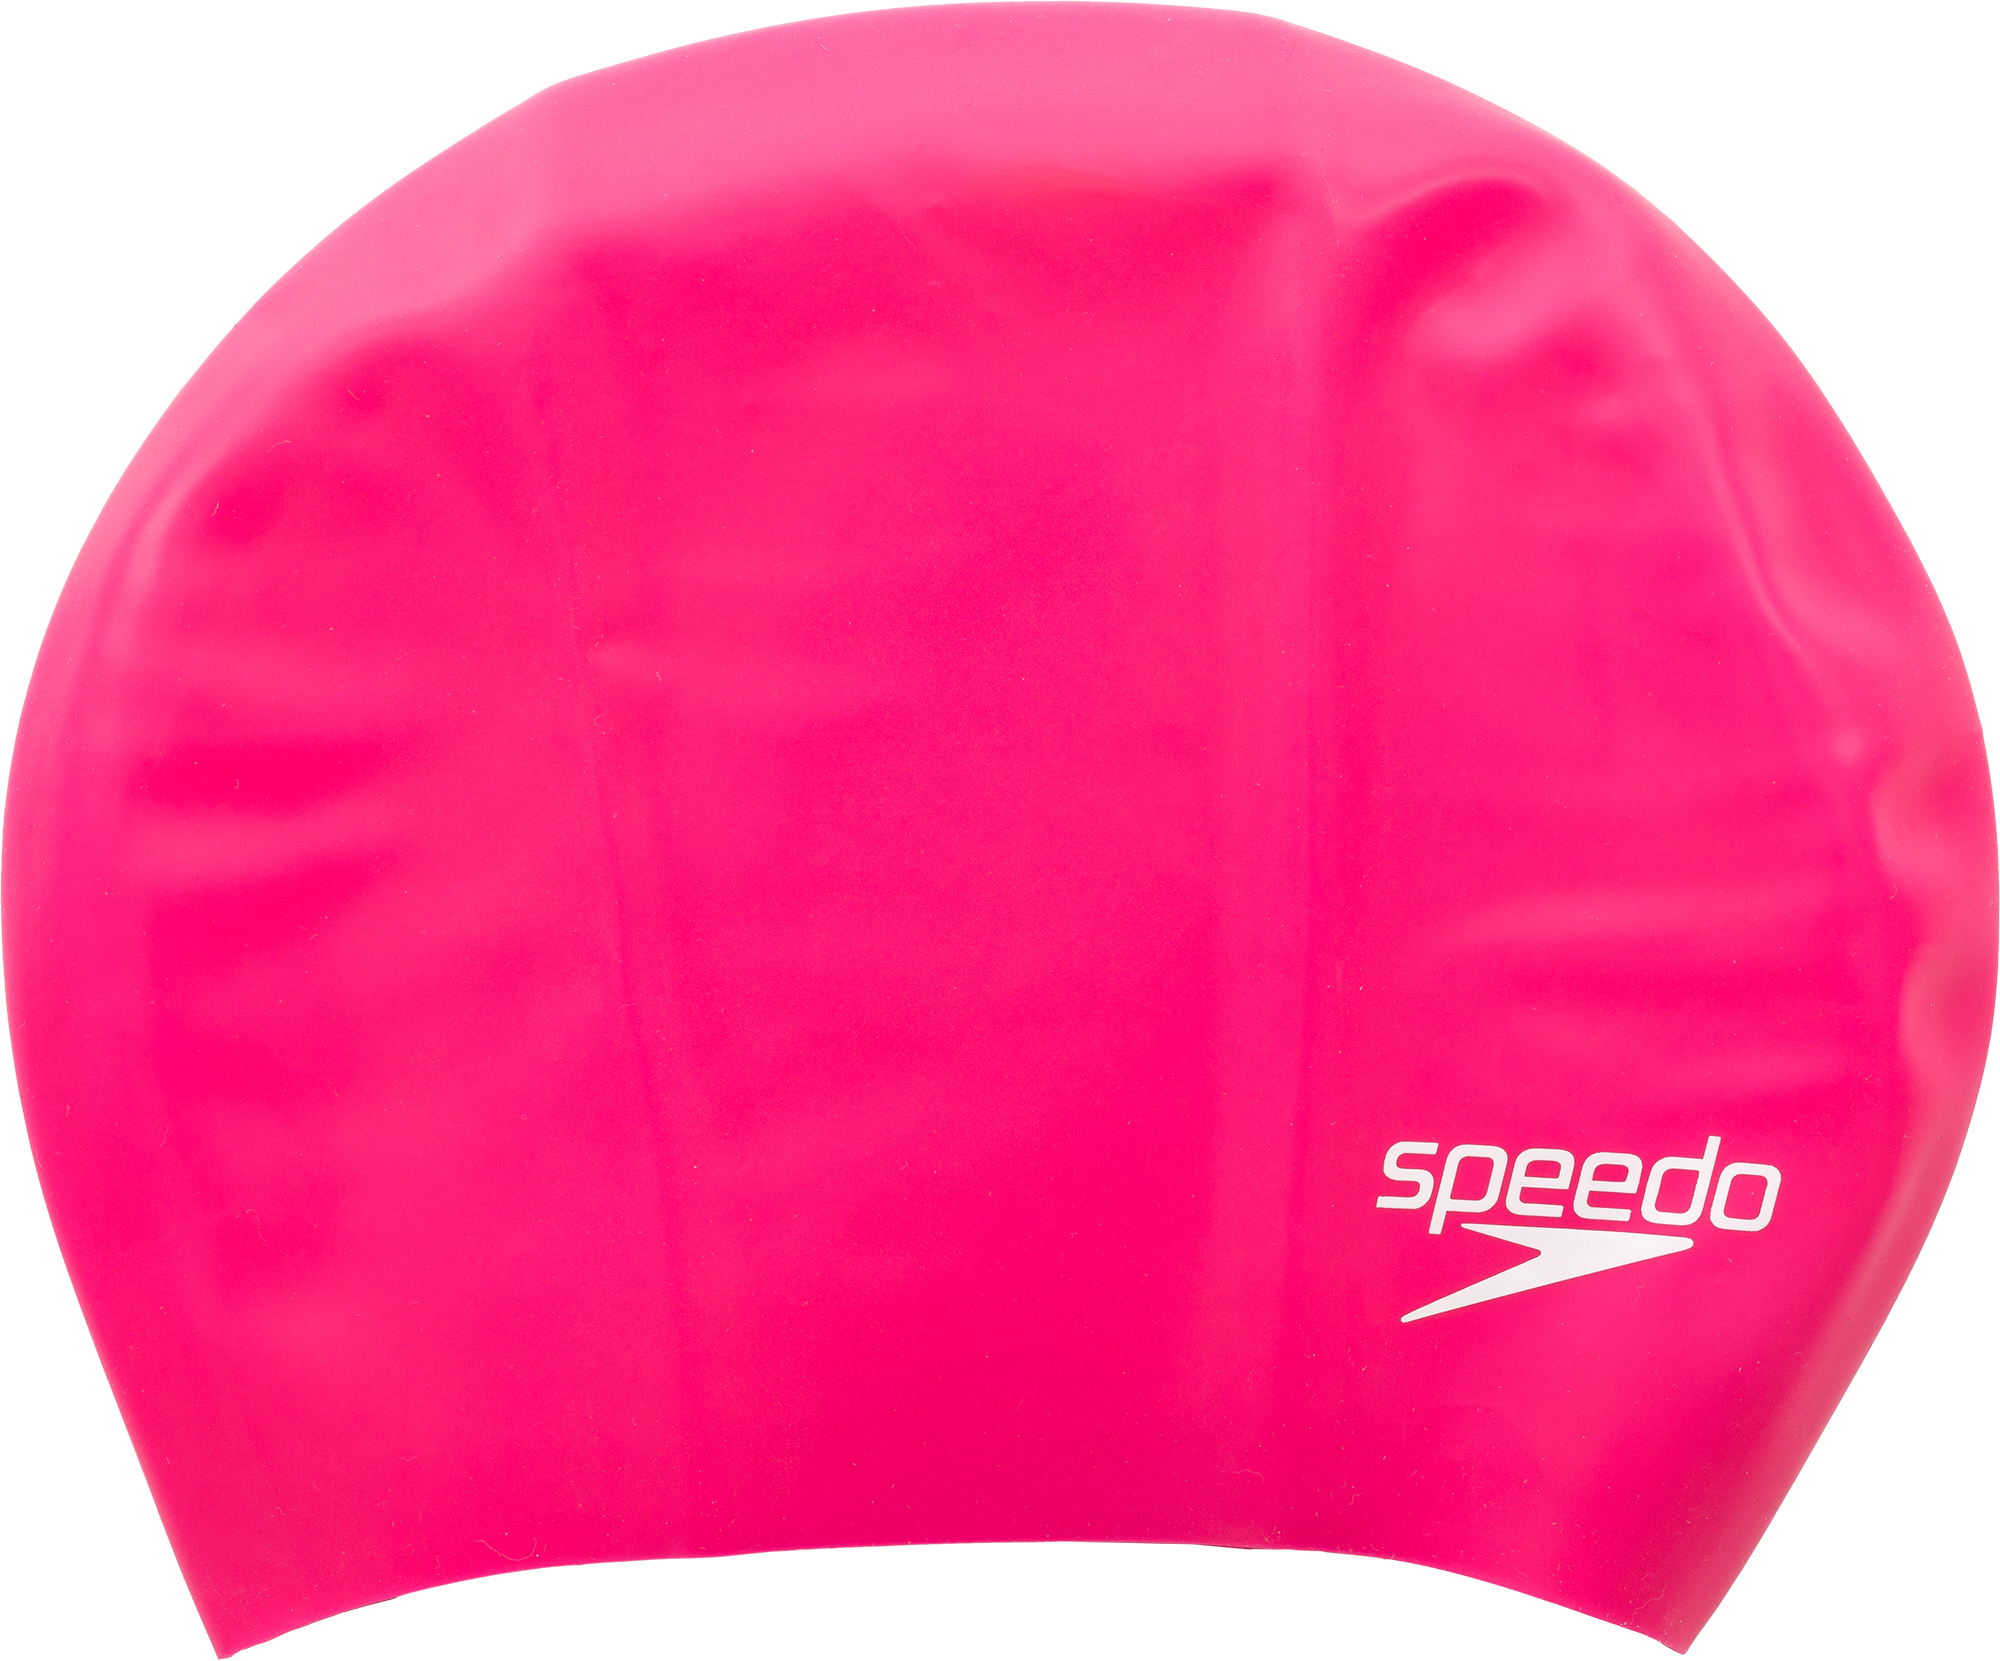 Speedo Шапочка для плавания взрослая Speedo, размер Без размера цена